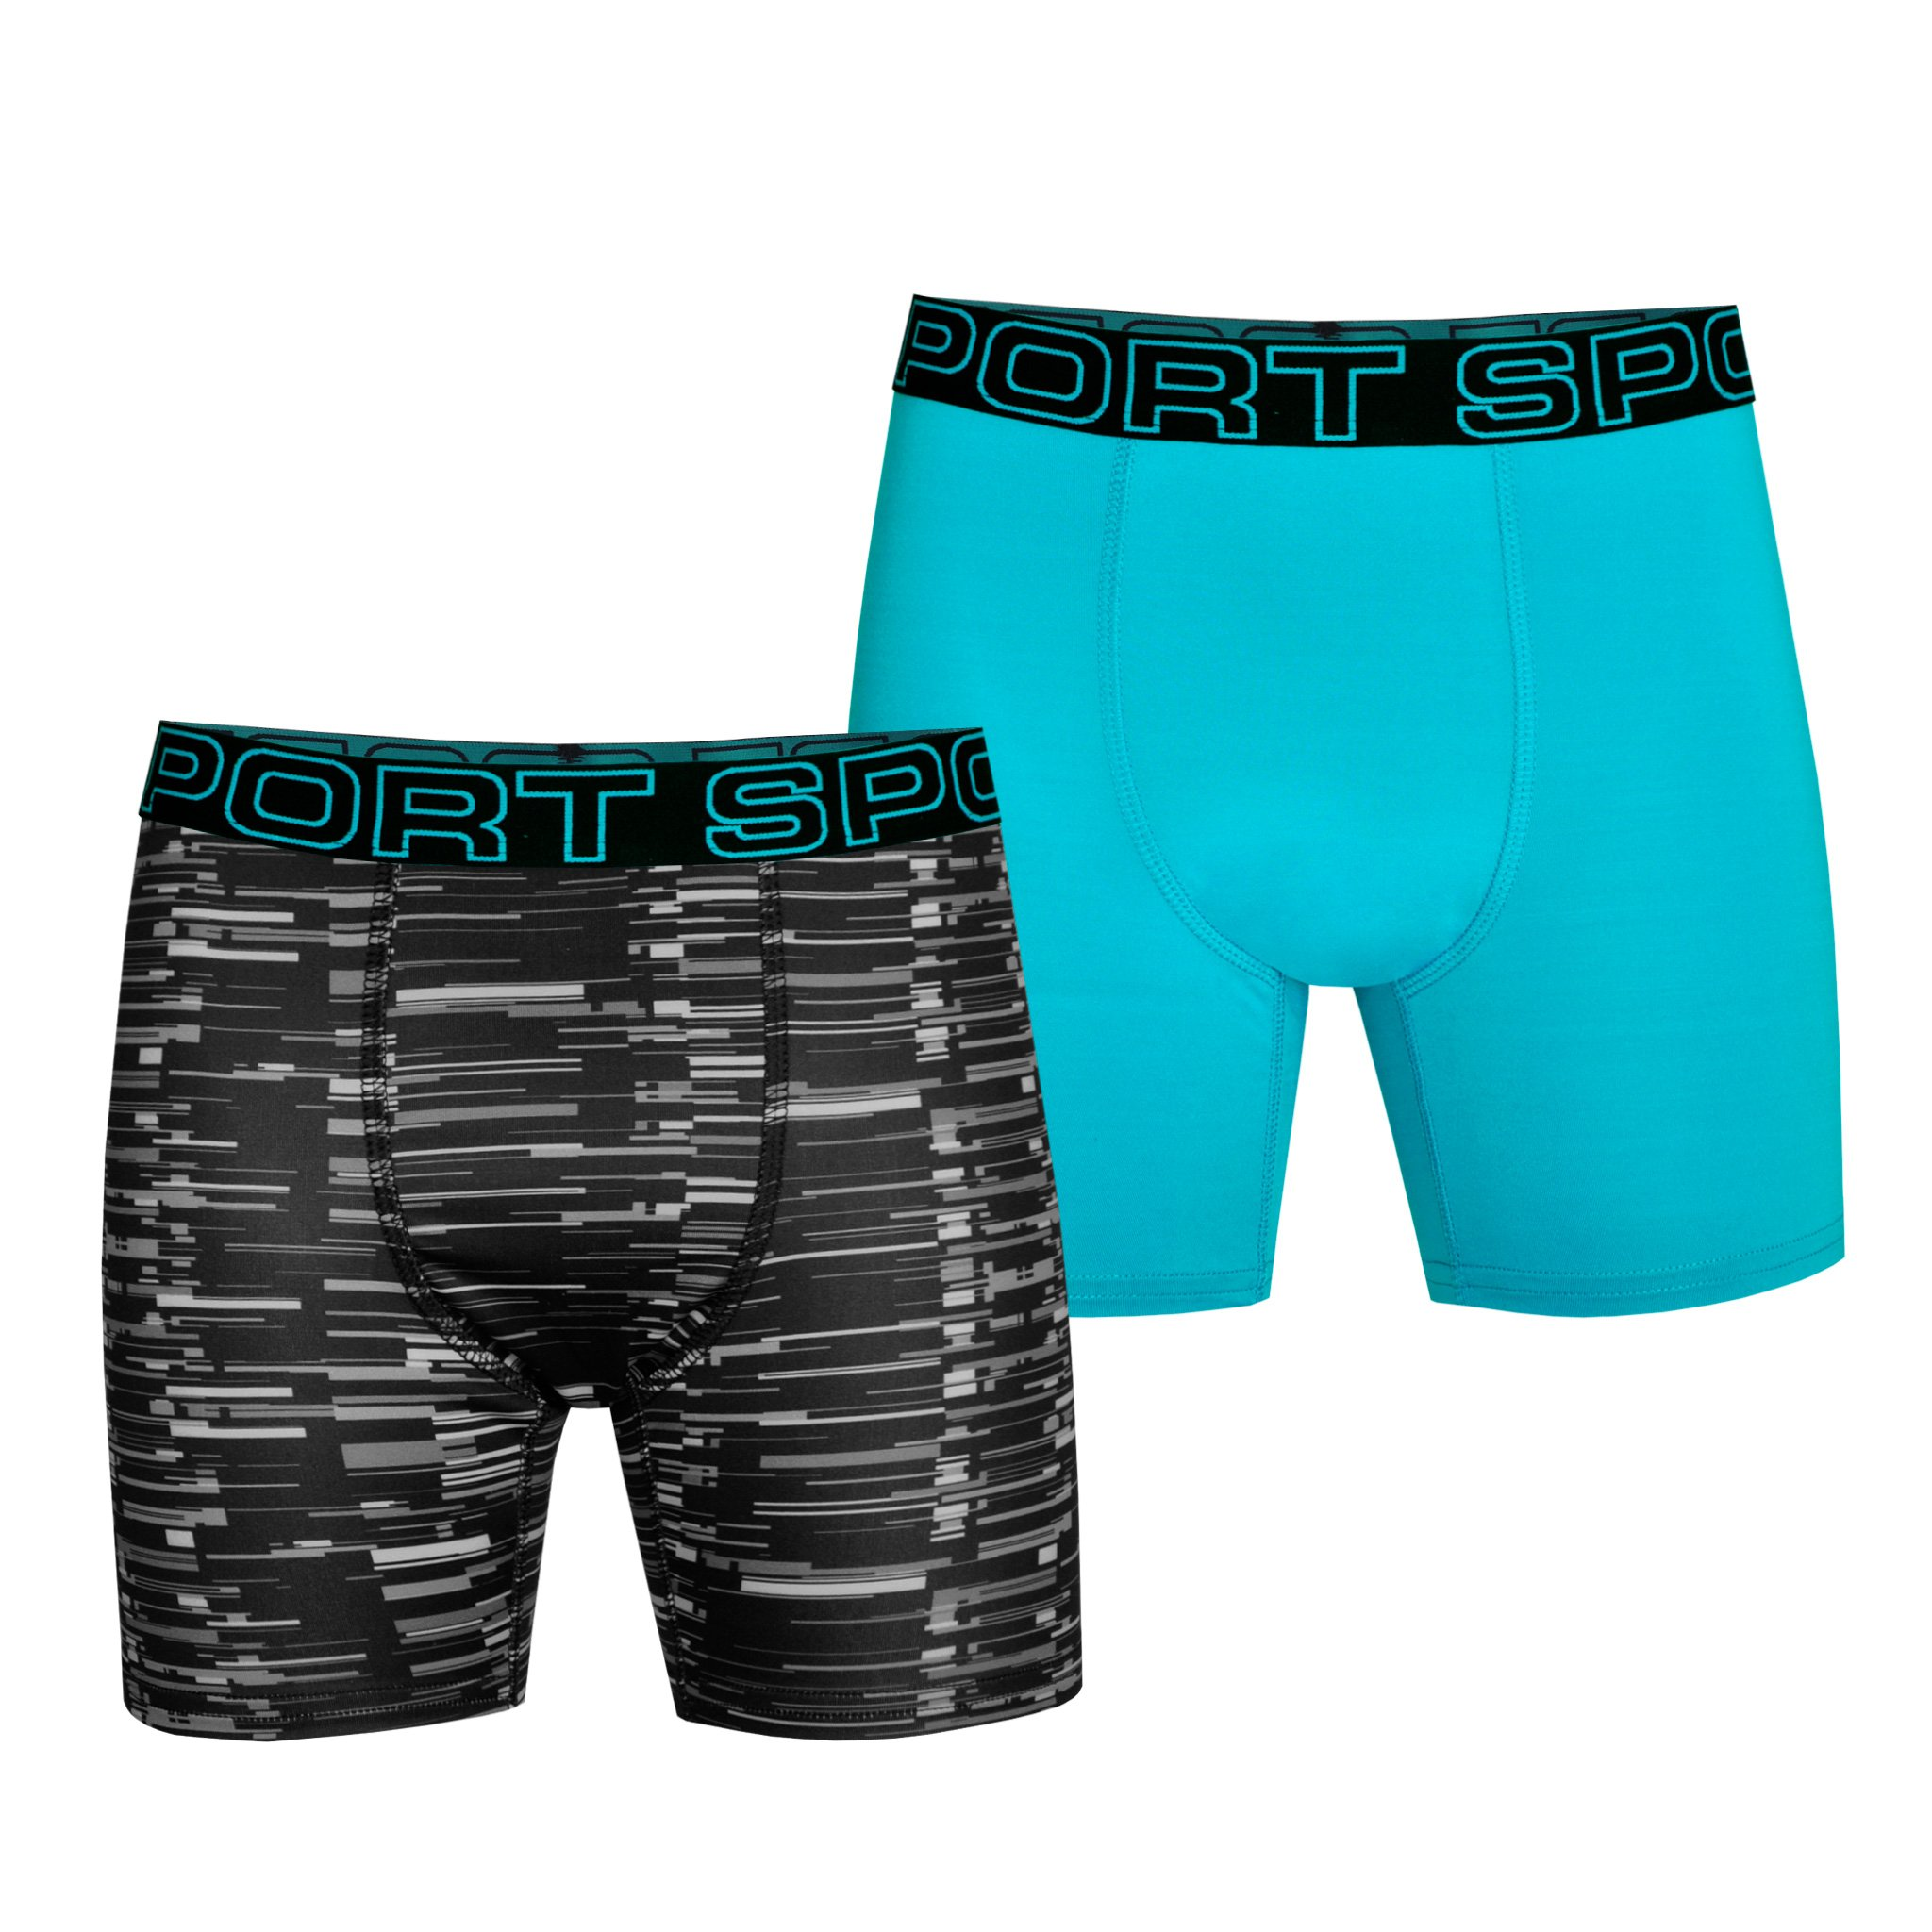 Watsons Boys 2 Pack Pro Sport Performance Underwear Multi X-Large